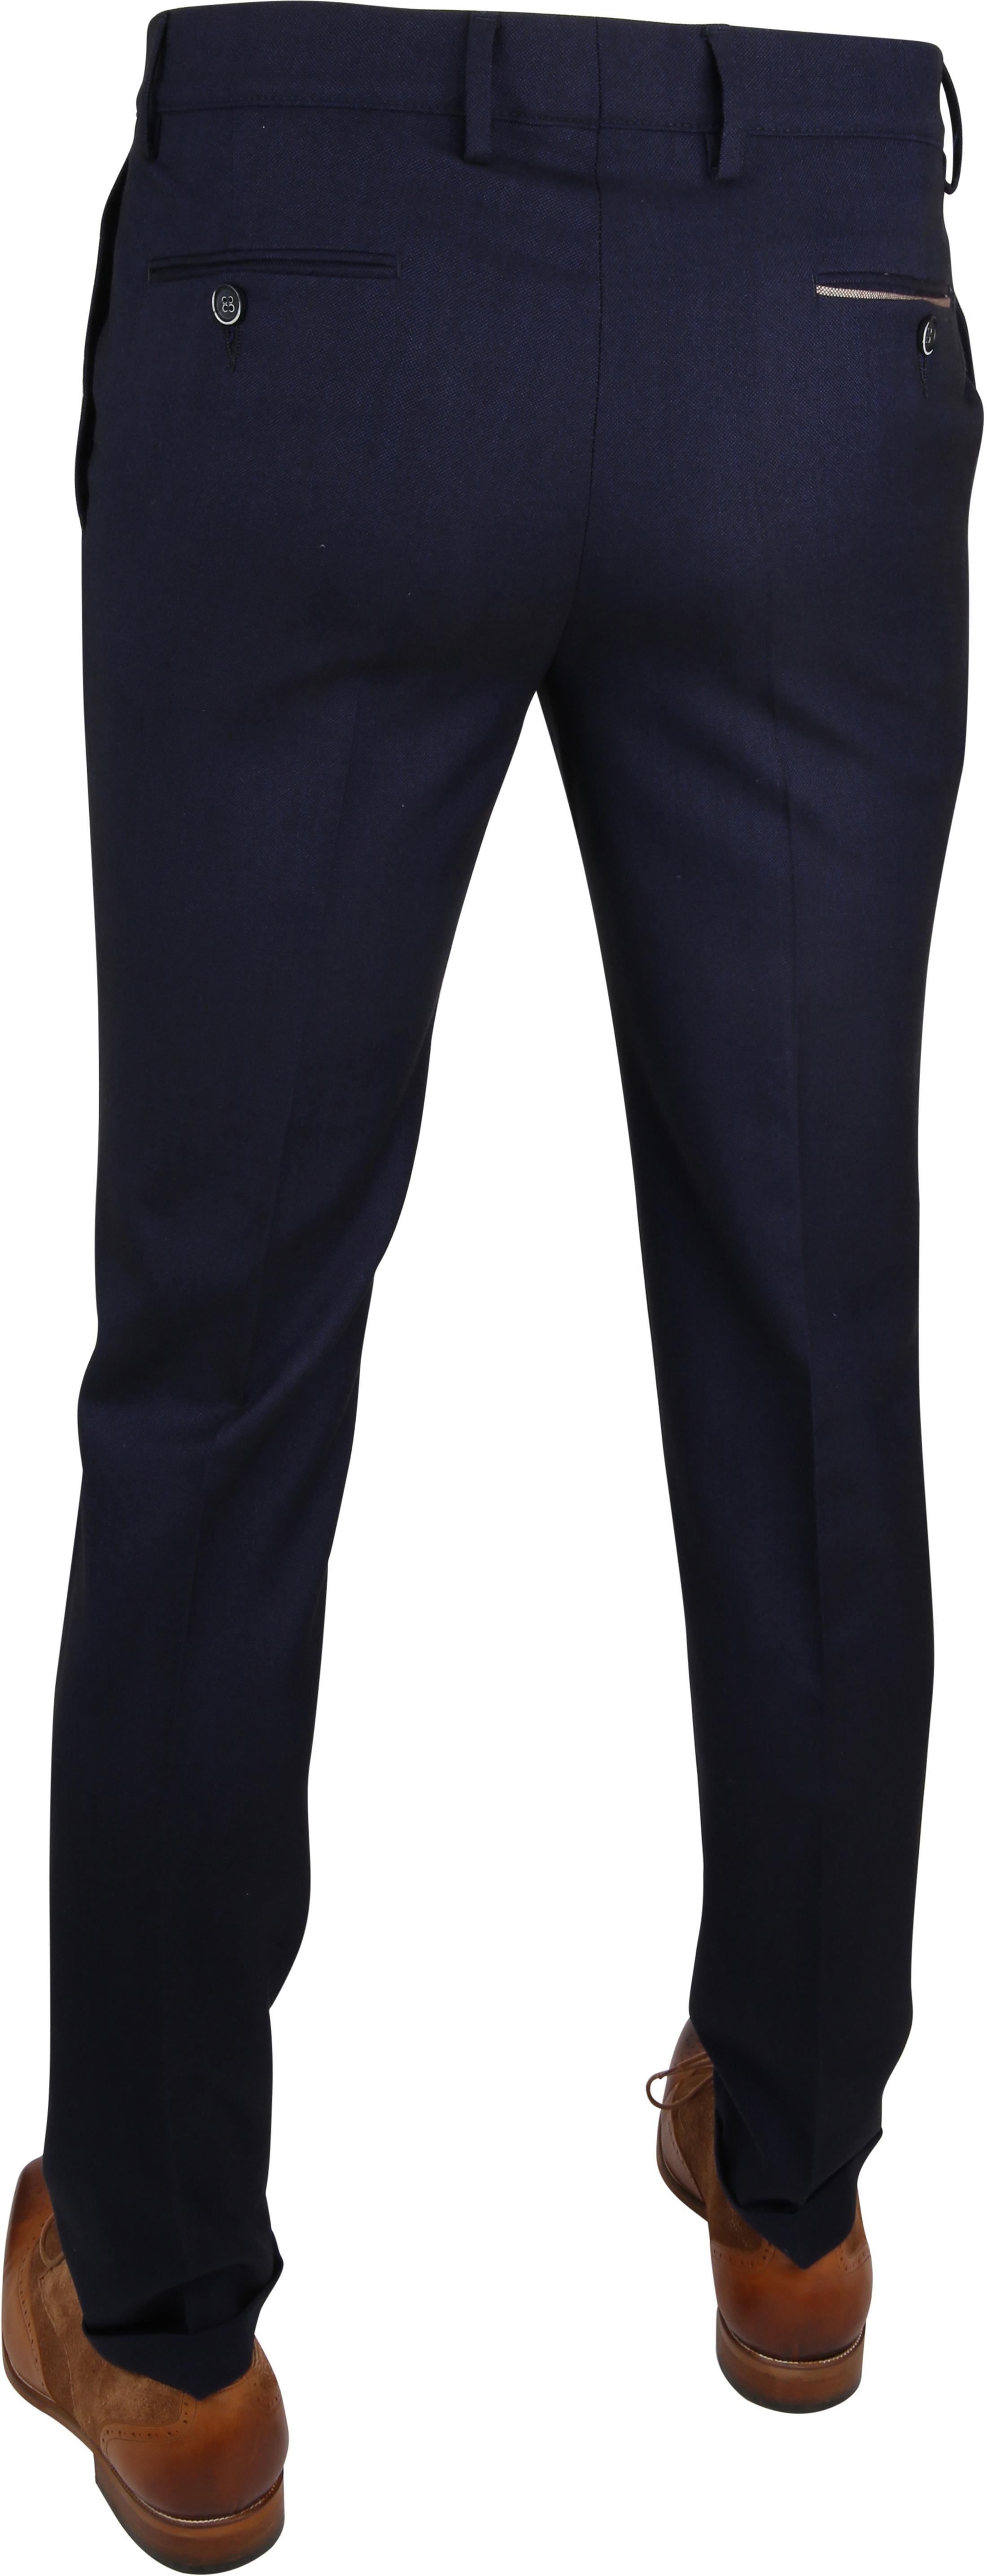 Suitable Premium Pantalon Rimini Navy foto 1